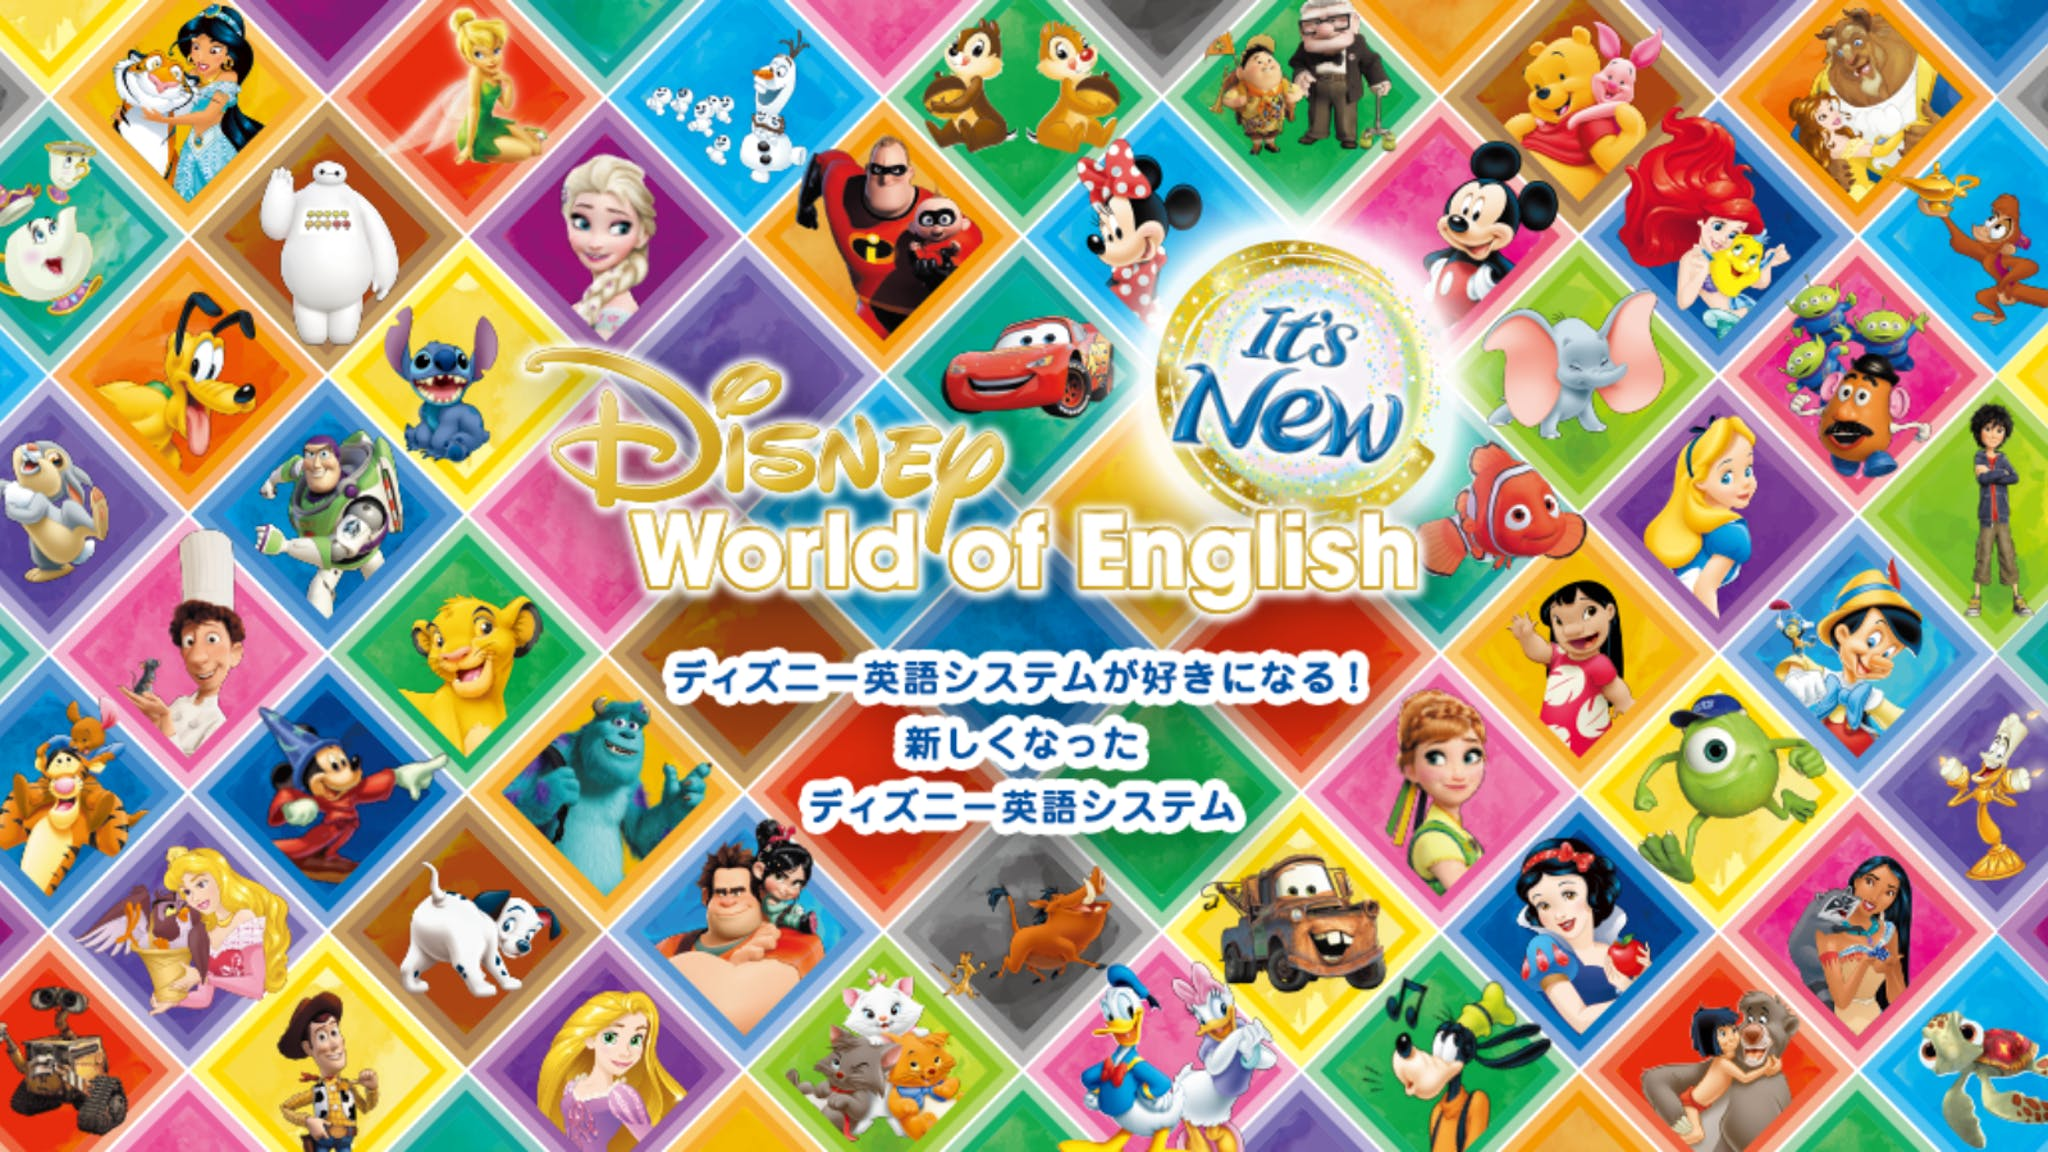 World Familyさま/サービスサイト